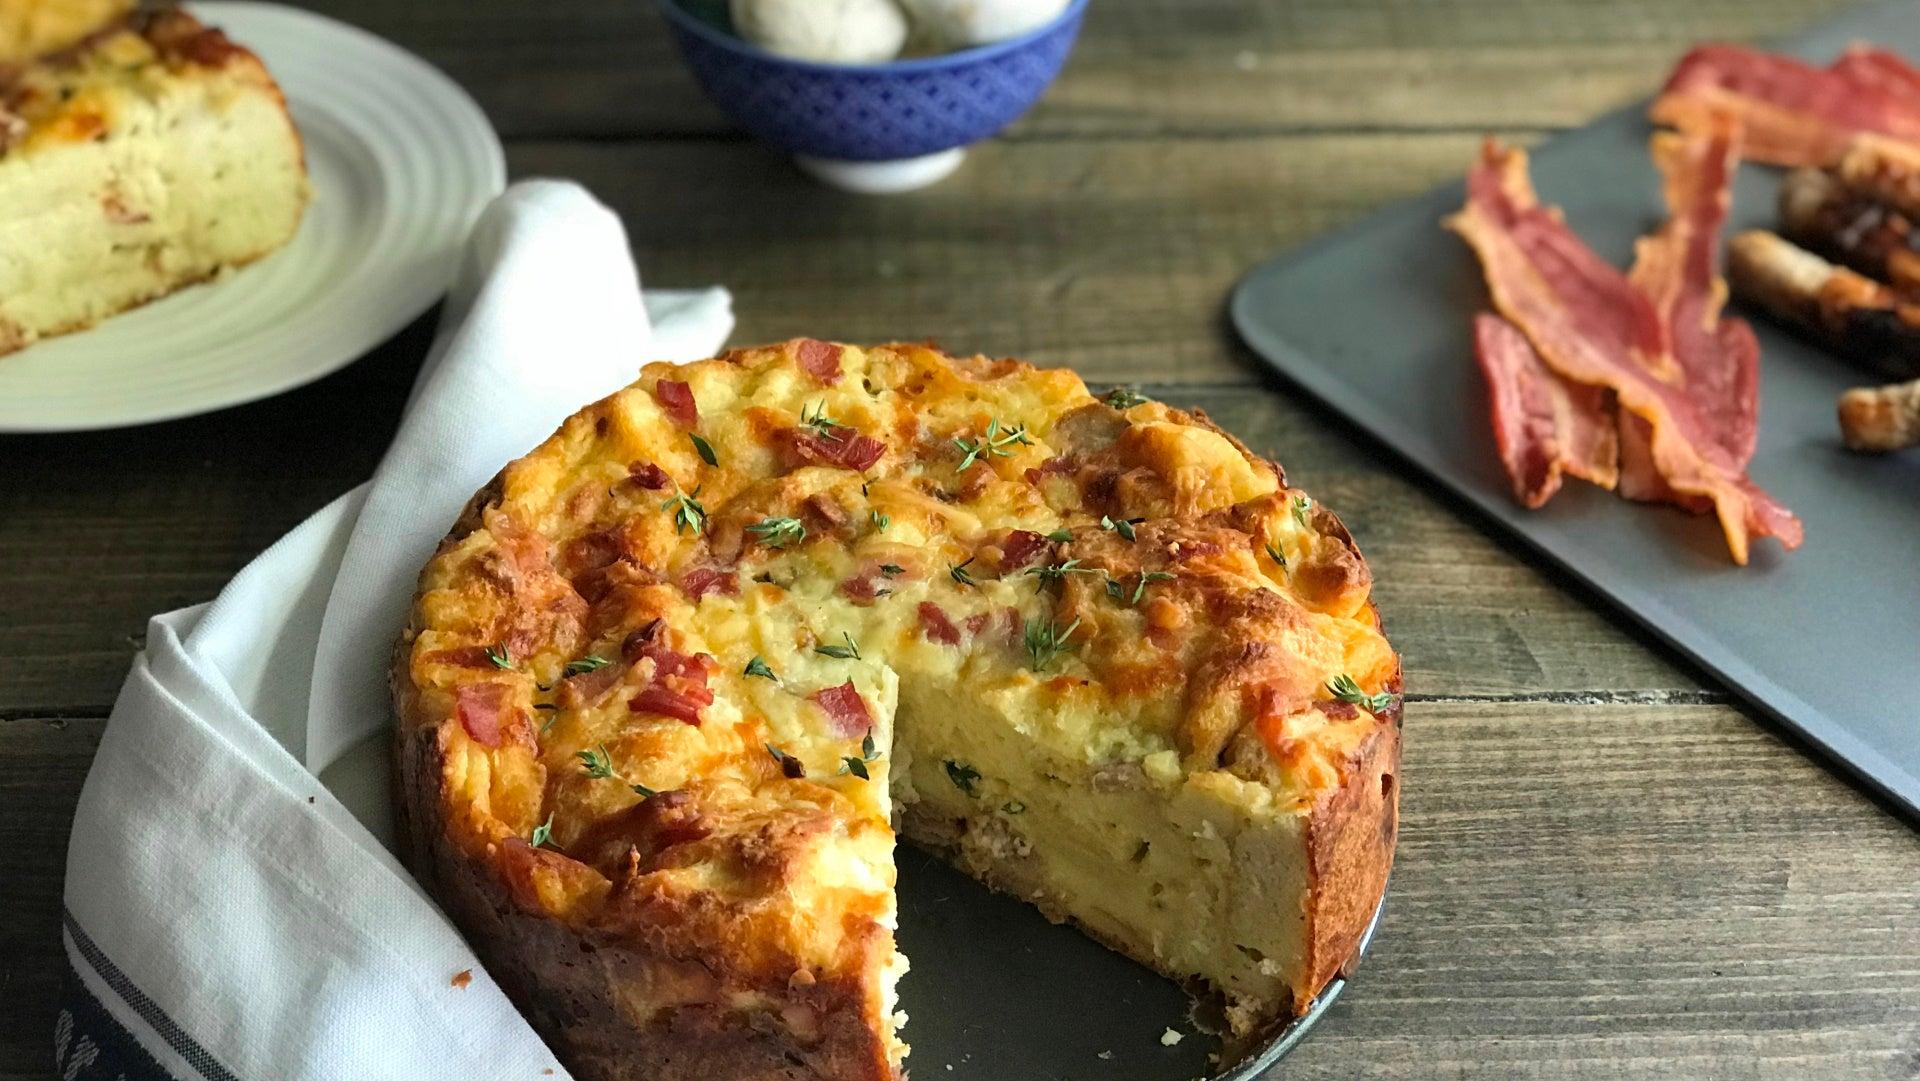 All-Day-Breakfast-Bread-Butter-Pudding_HEADER.jpg